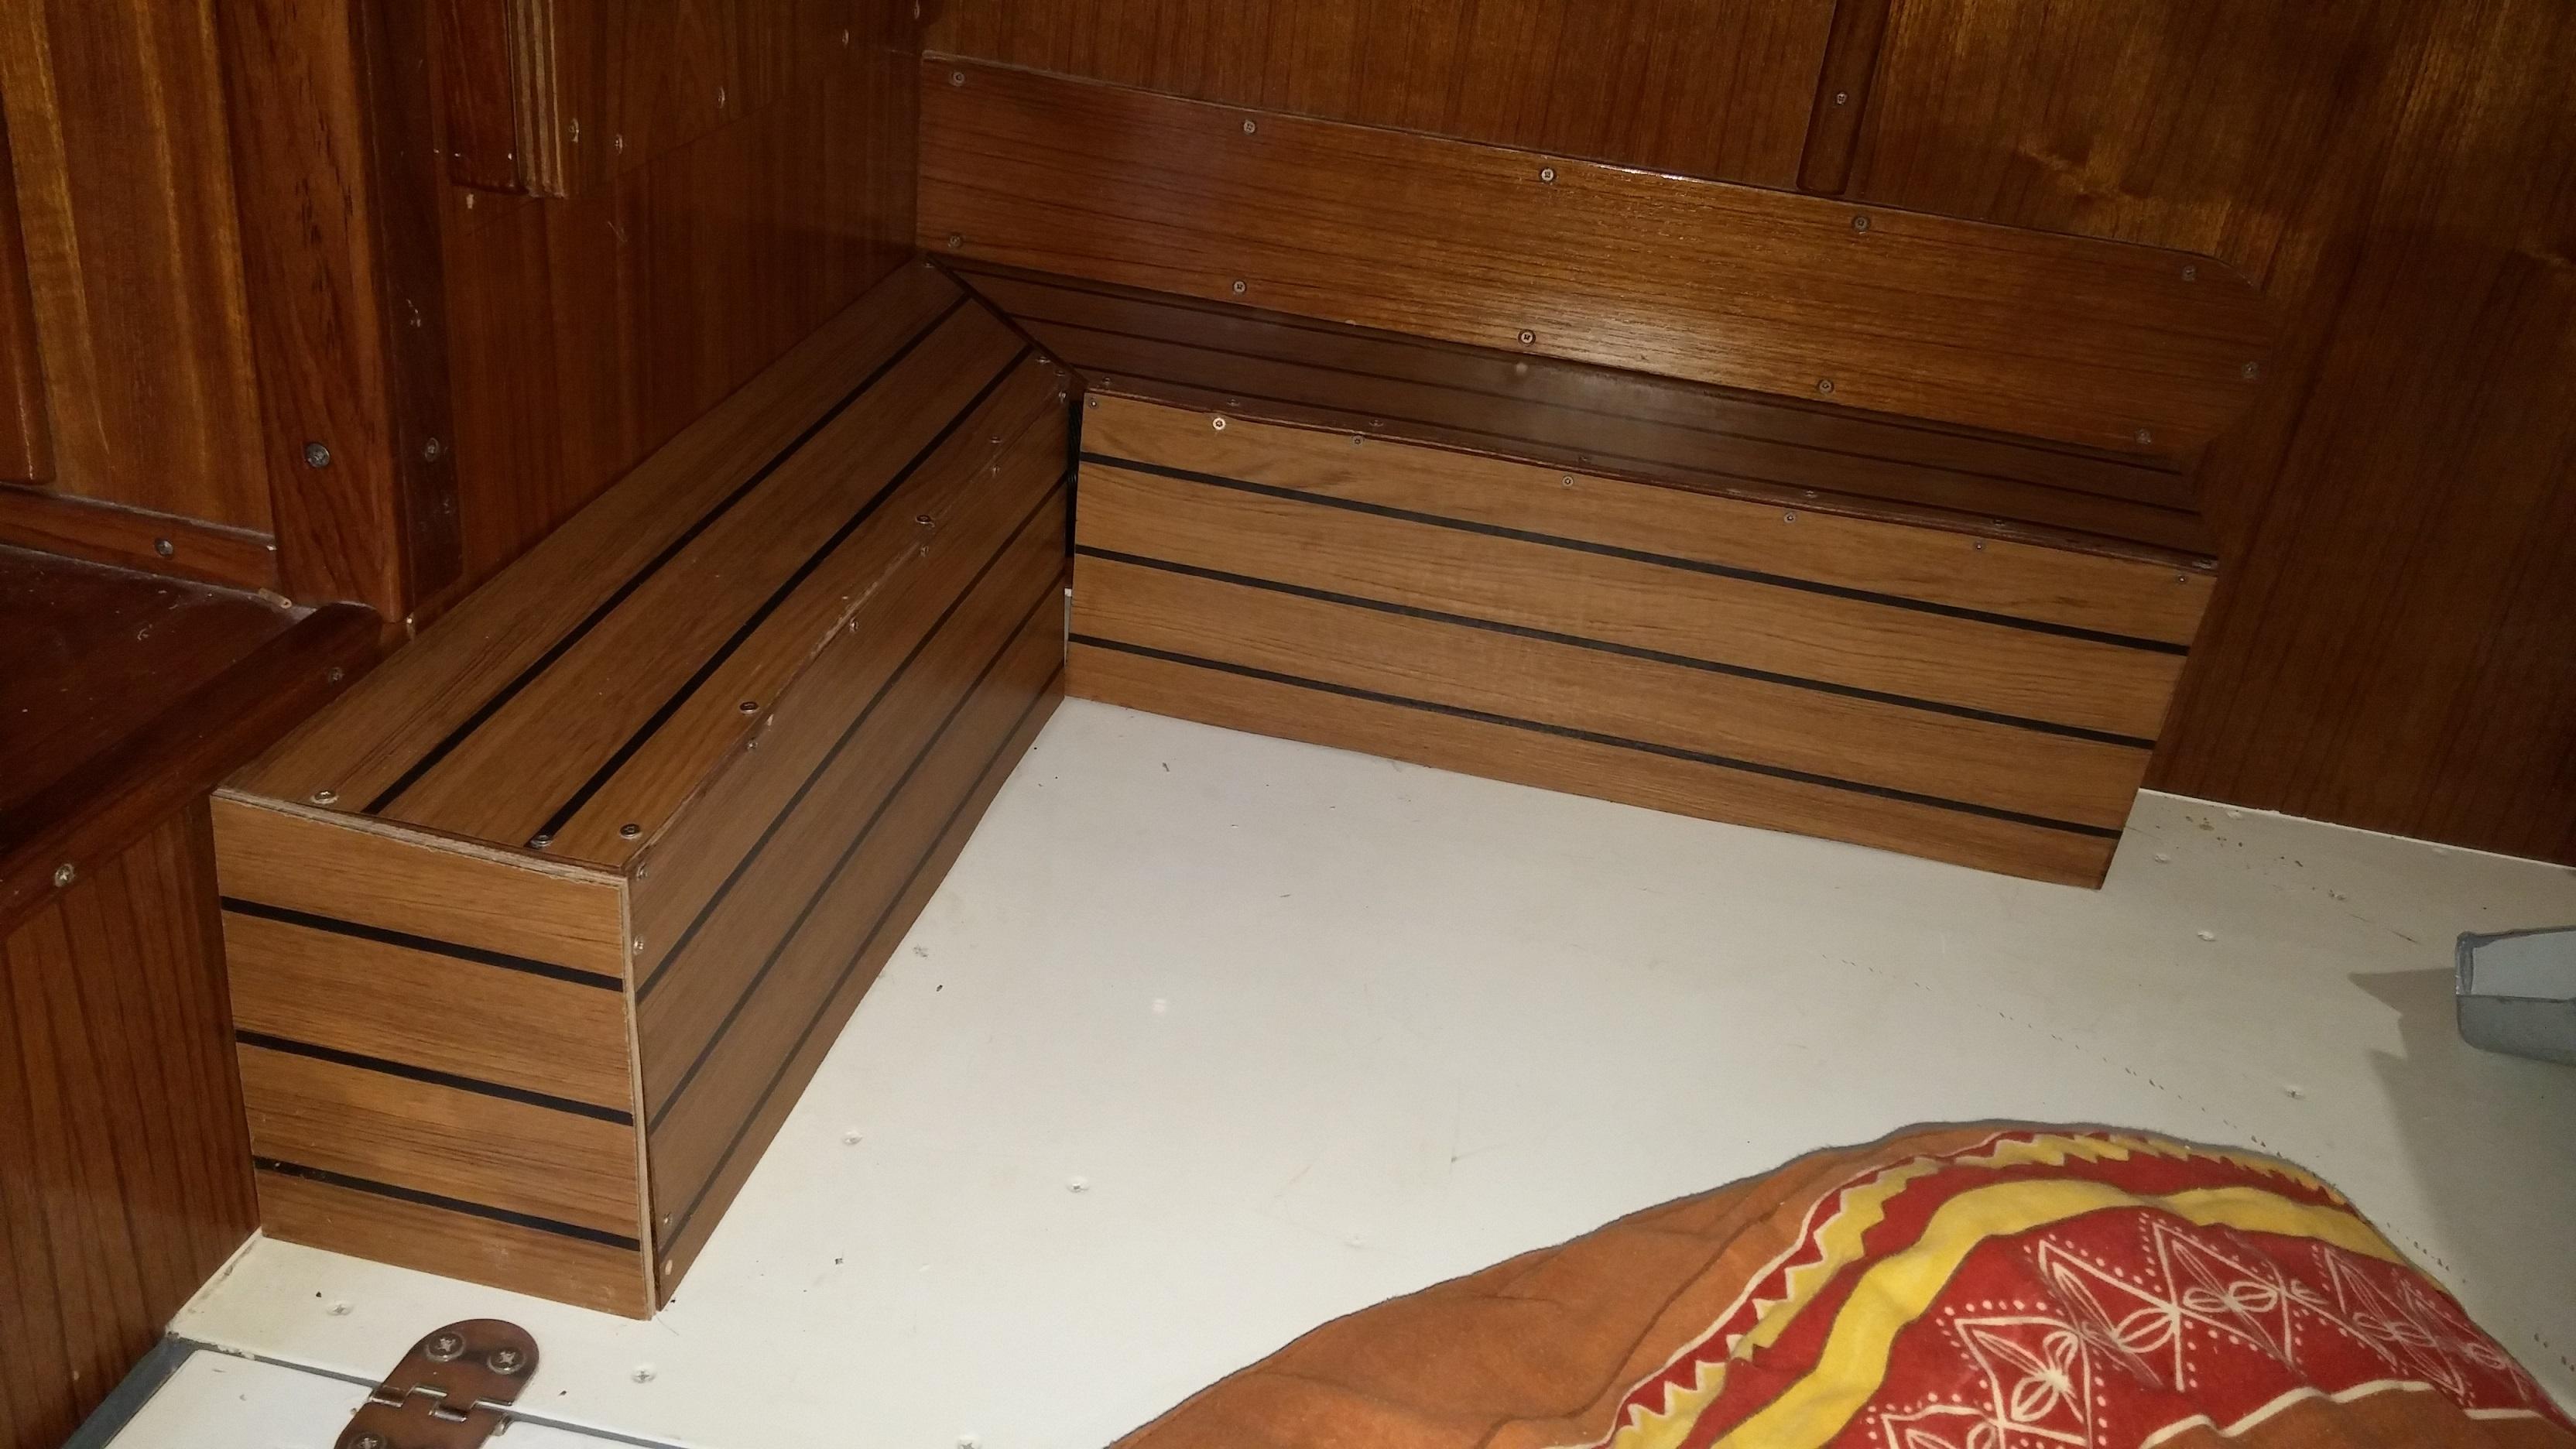 heizungsverkleidung 7 jahre 7 meere. Black Bedroom Furniture Sets. Home Design Ideas